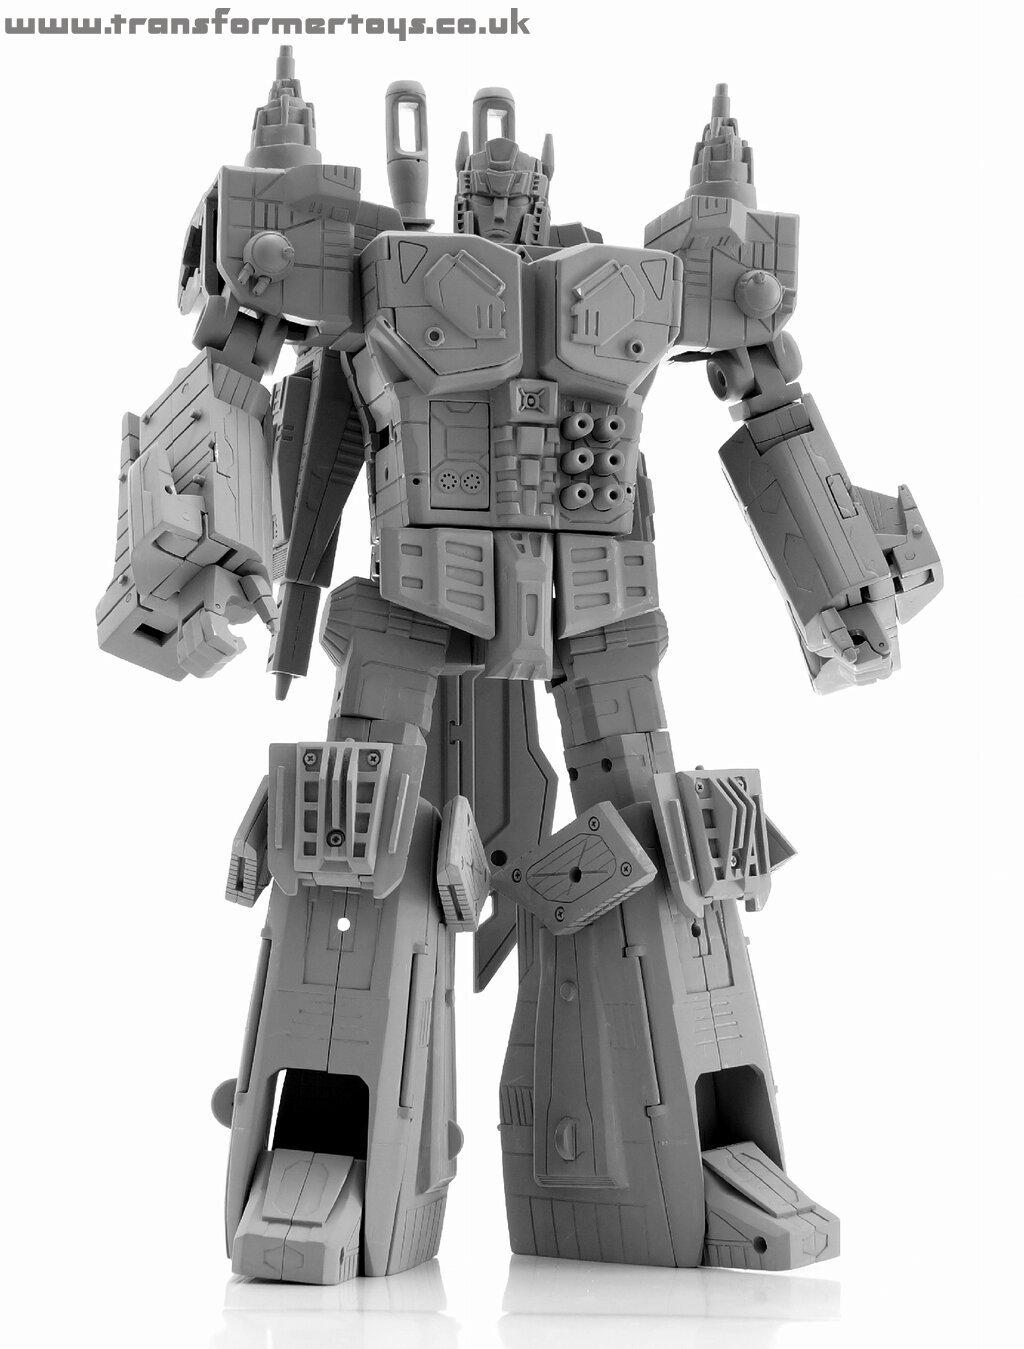 [BTS Toys] Produit Tiers - BTS-03 Kit G1 de Matrice d'Optimus, BTS-04 Sonicron (Soundwave/Radar), Mini cassettes Décepticons, Fort Maximus, Blaster/Tempo, BTS-06 Nova Lord (aka Overlord) - Page 2 Bts-nova-lord-aka-not-overlord-11